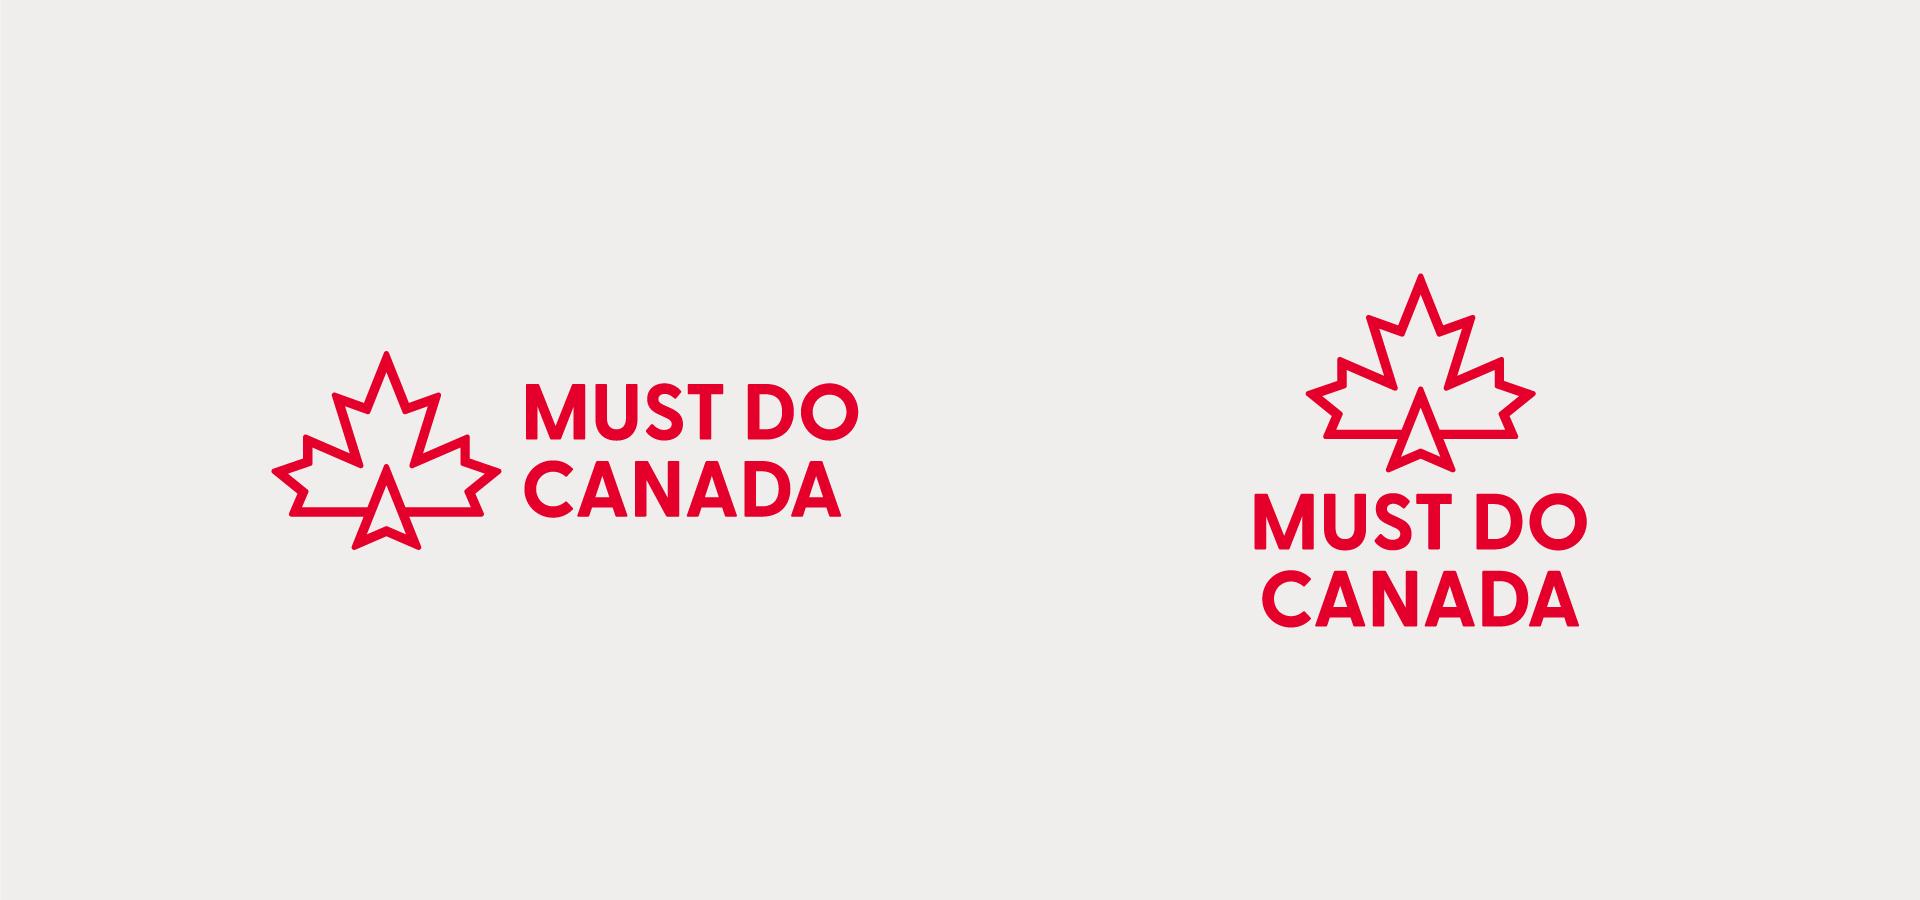 must-do-canada-logo-lockups